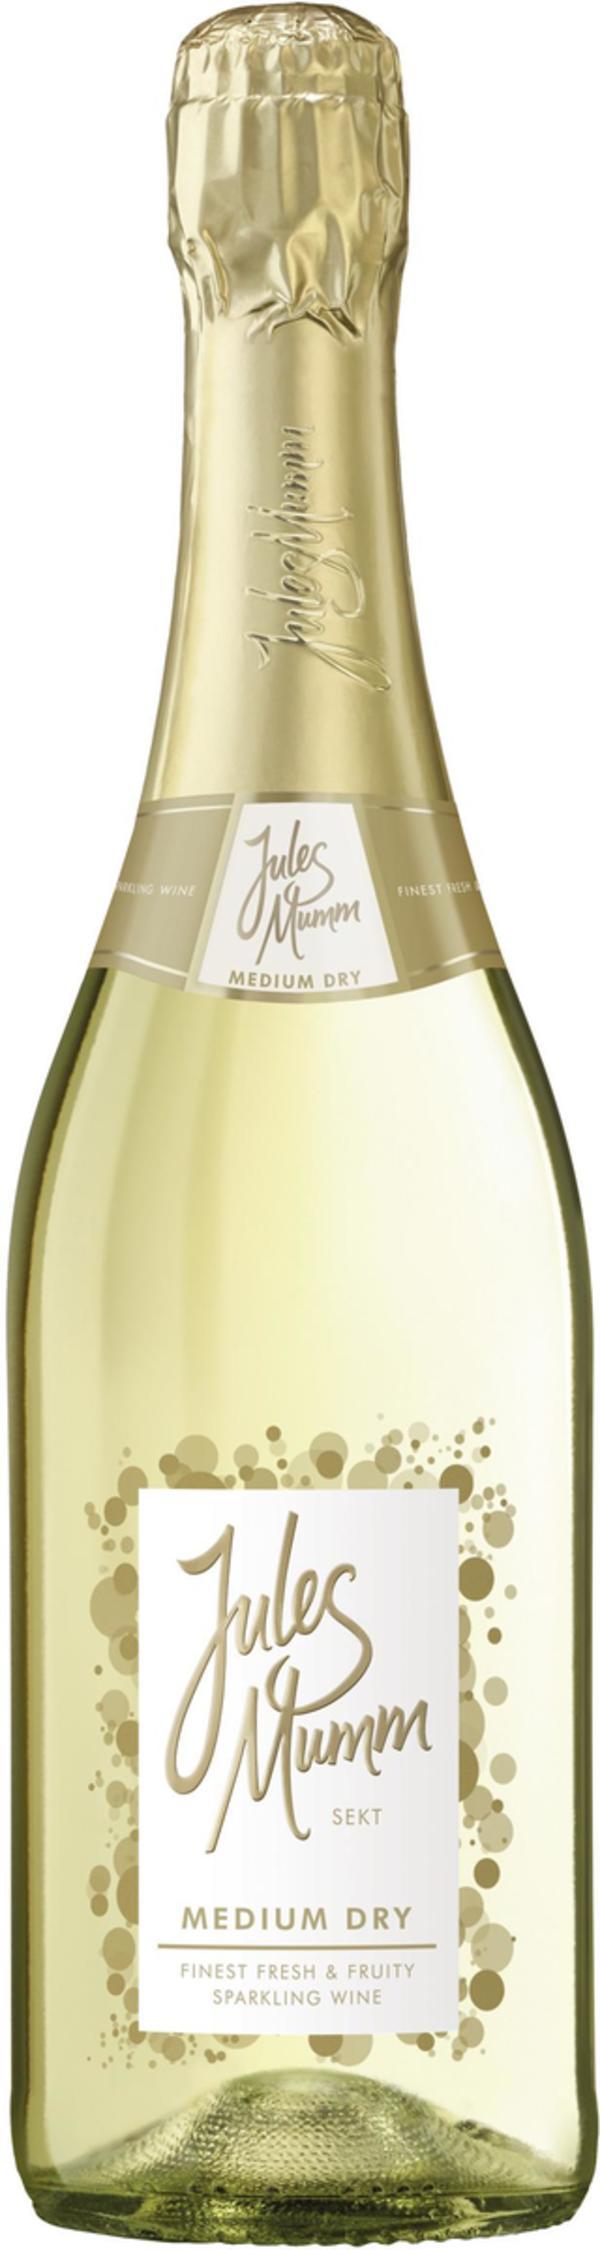 Jules Mumm Sekt Medium Dry 0,75l